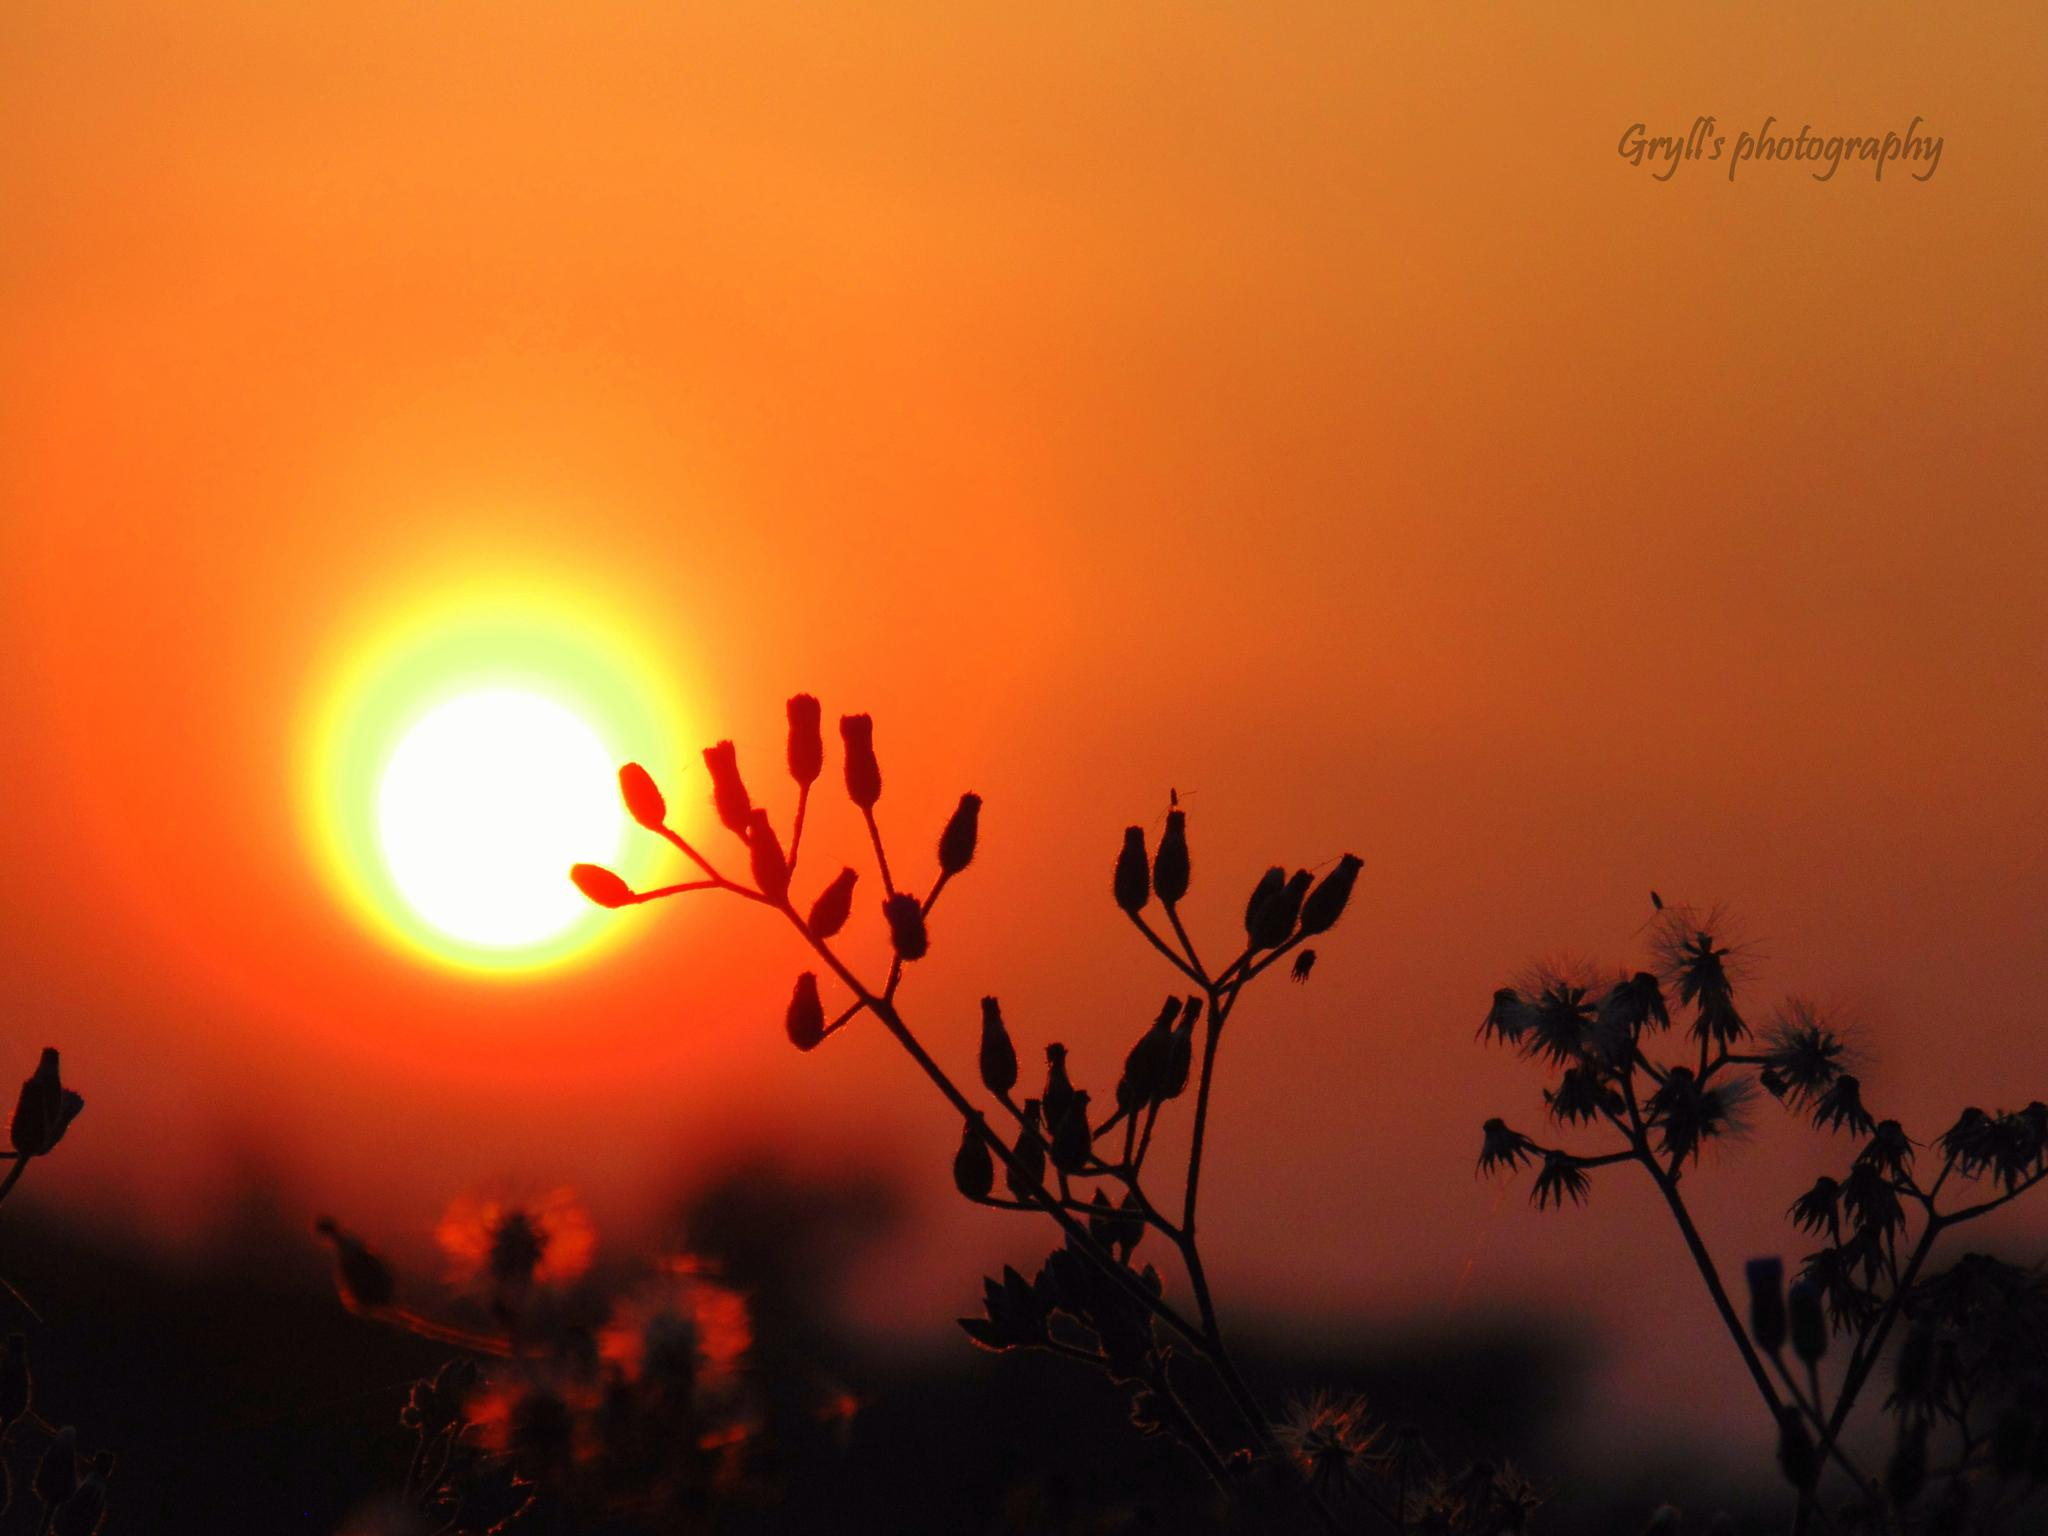 sunset by Girish Grylls